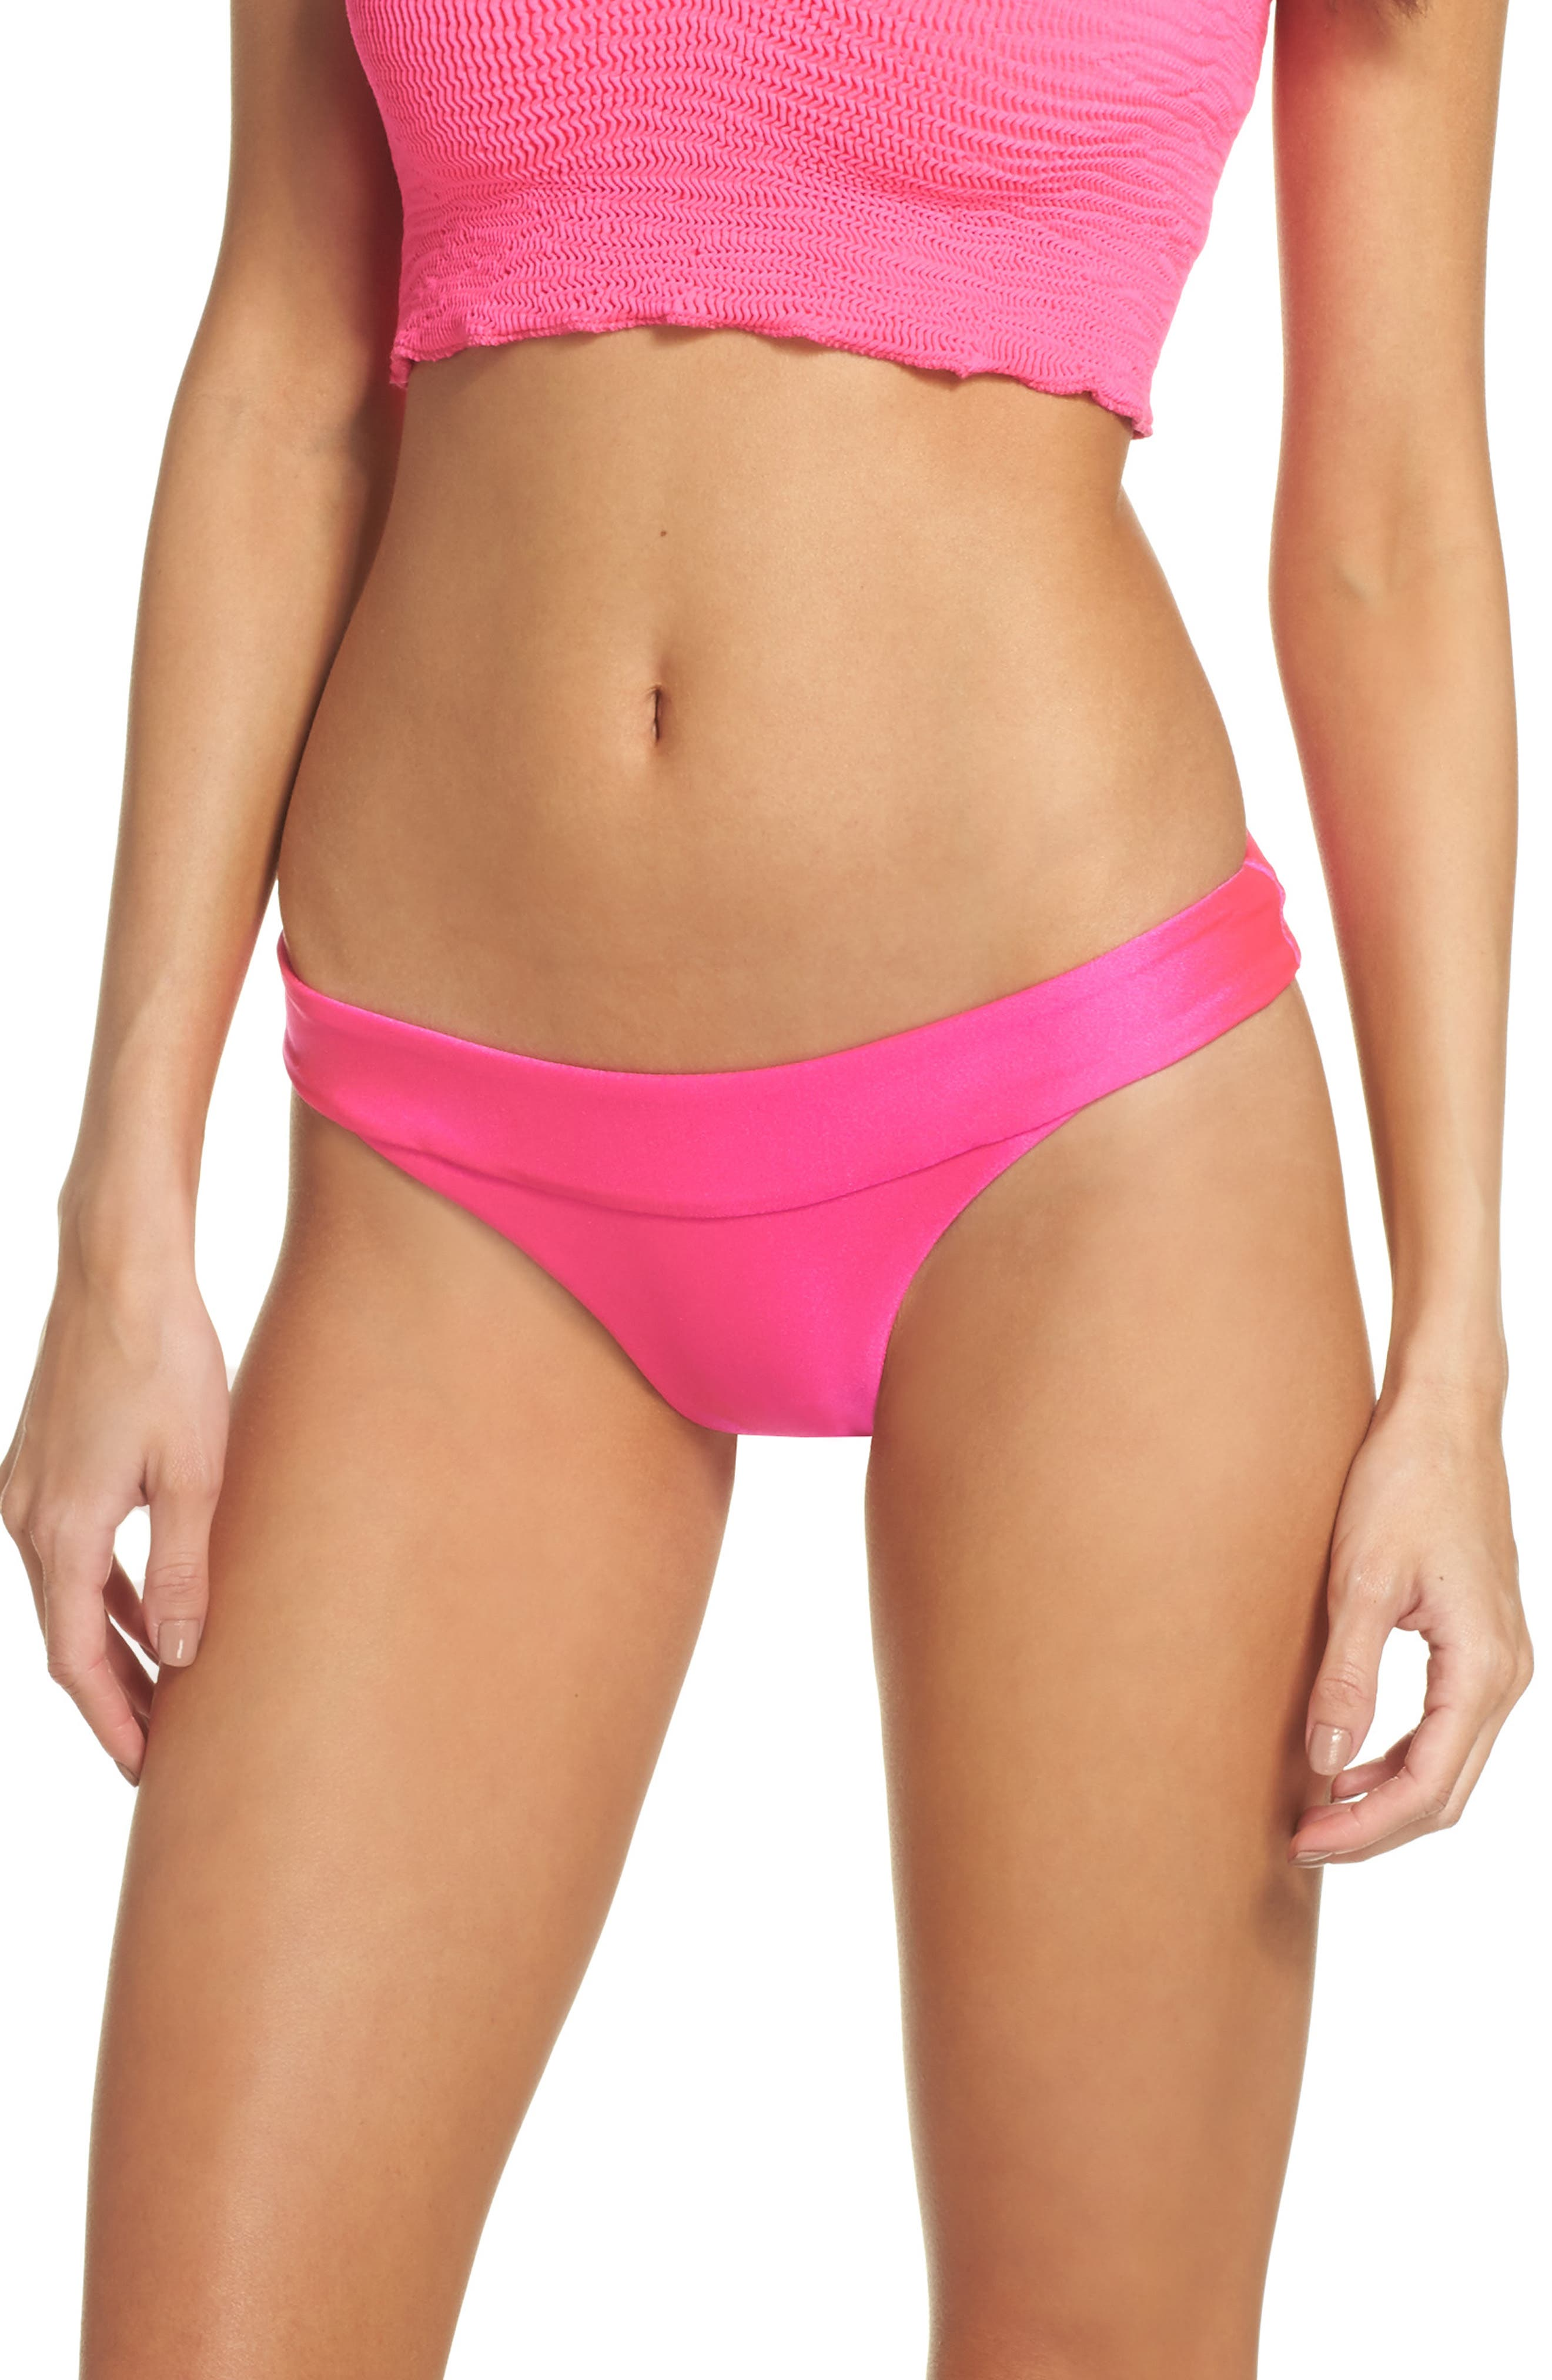 Isabella Rose Tubular Solid Bikini Bottoms